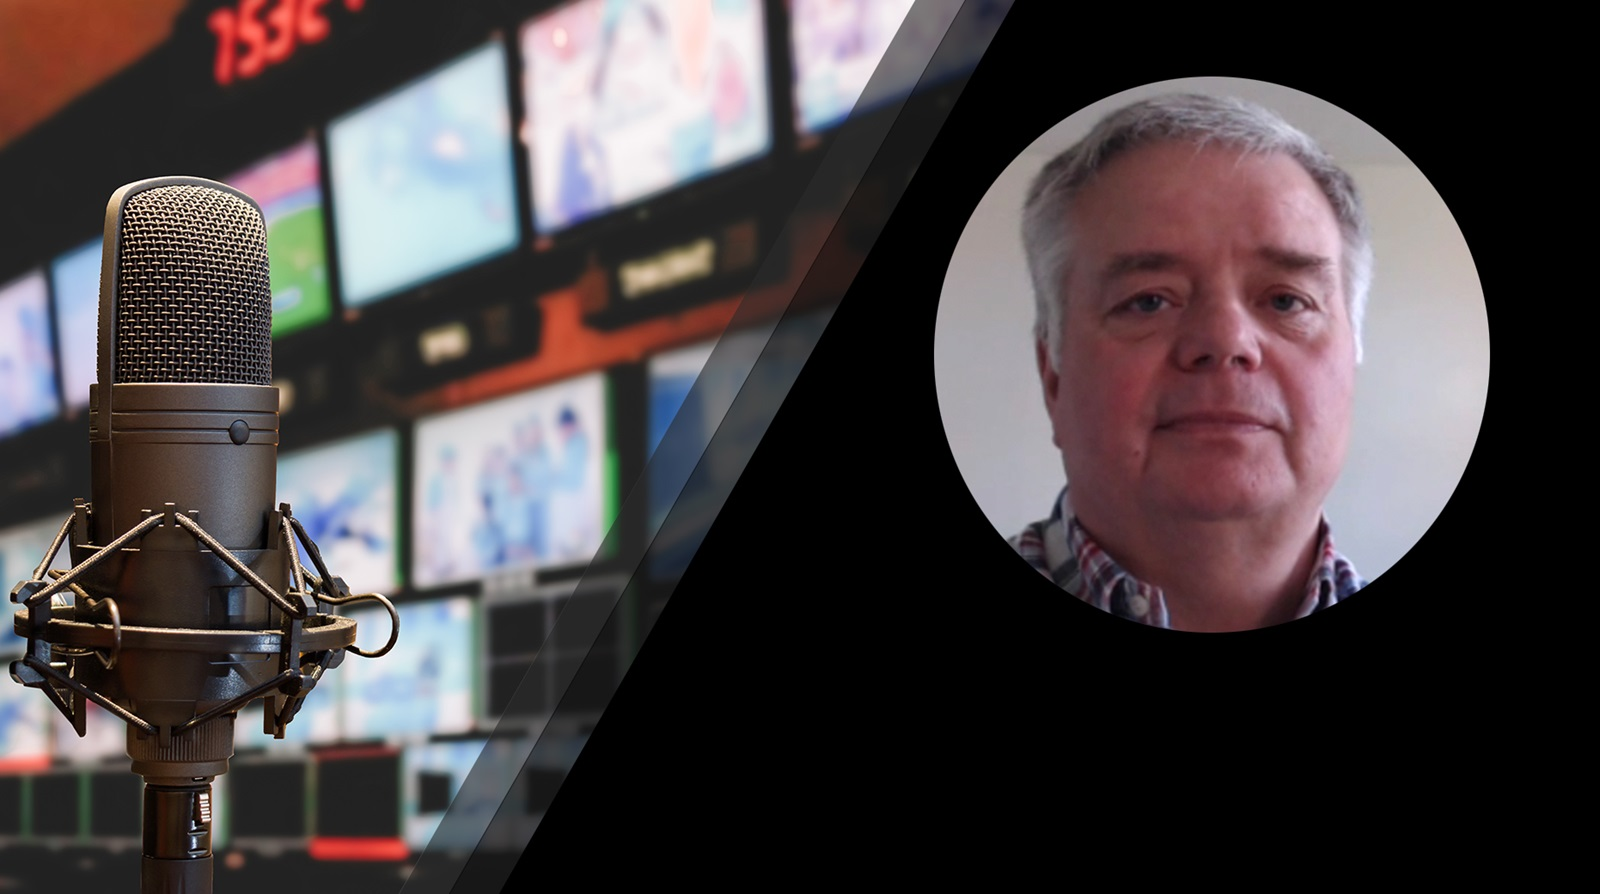 Morten Brandstrup on the Making the Media podcast